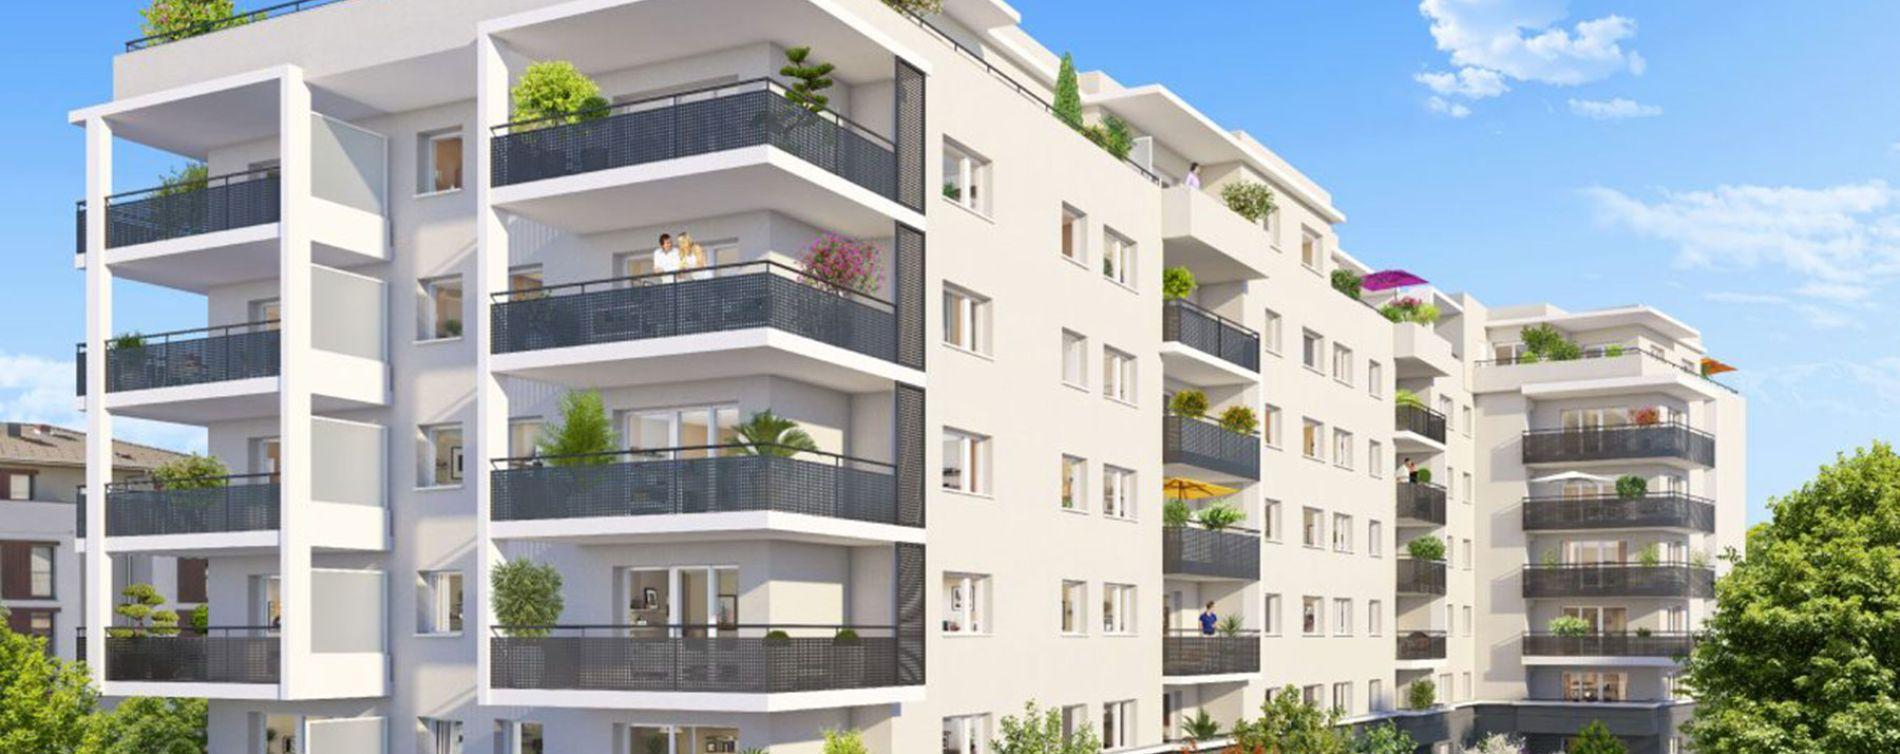 Annemasse : programme immobilier neuve « Shiro »